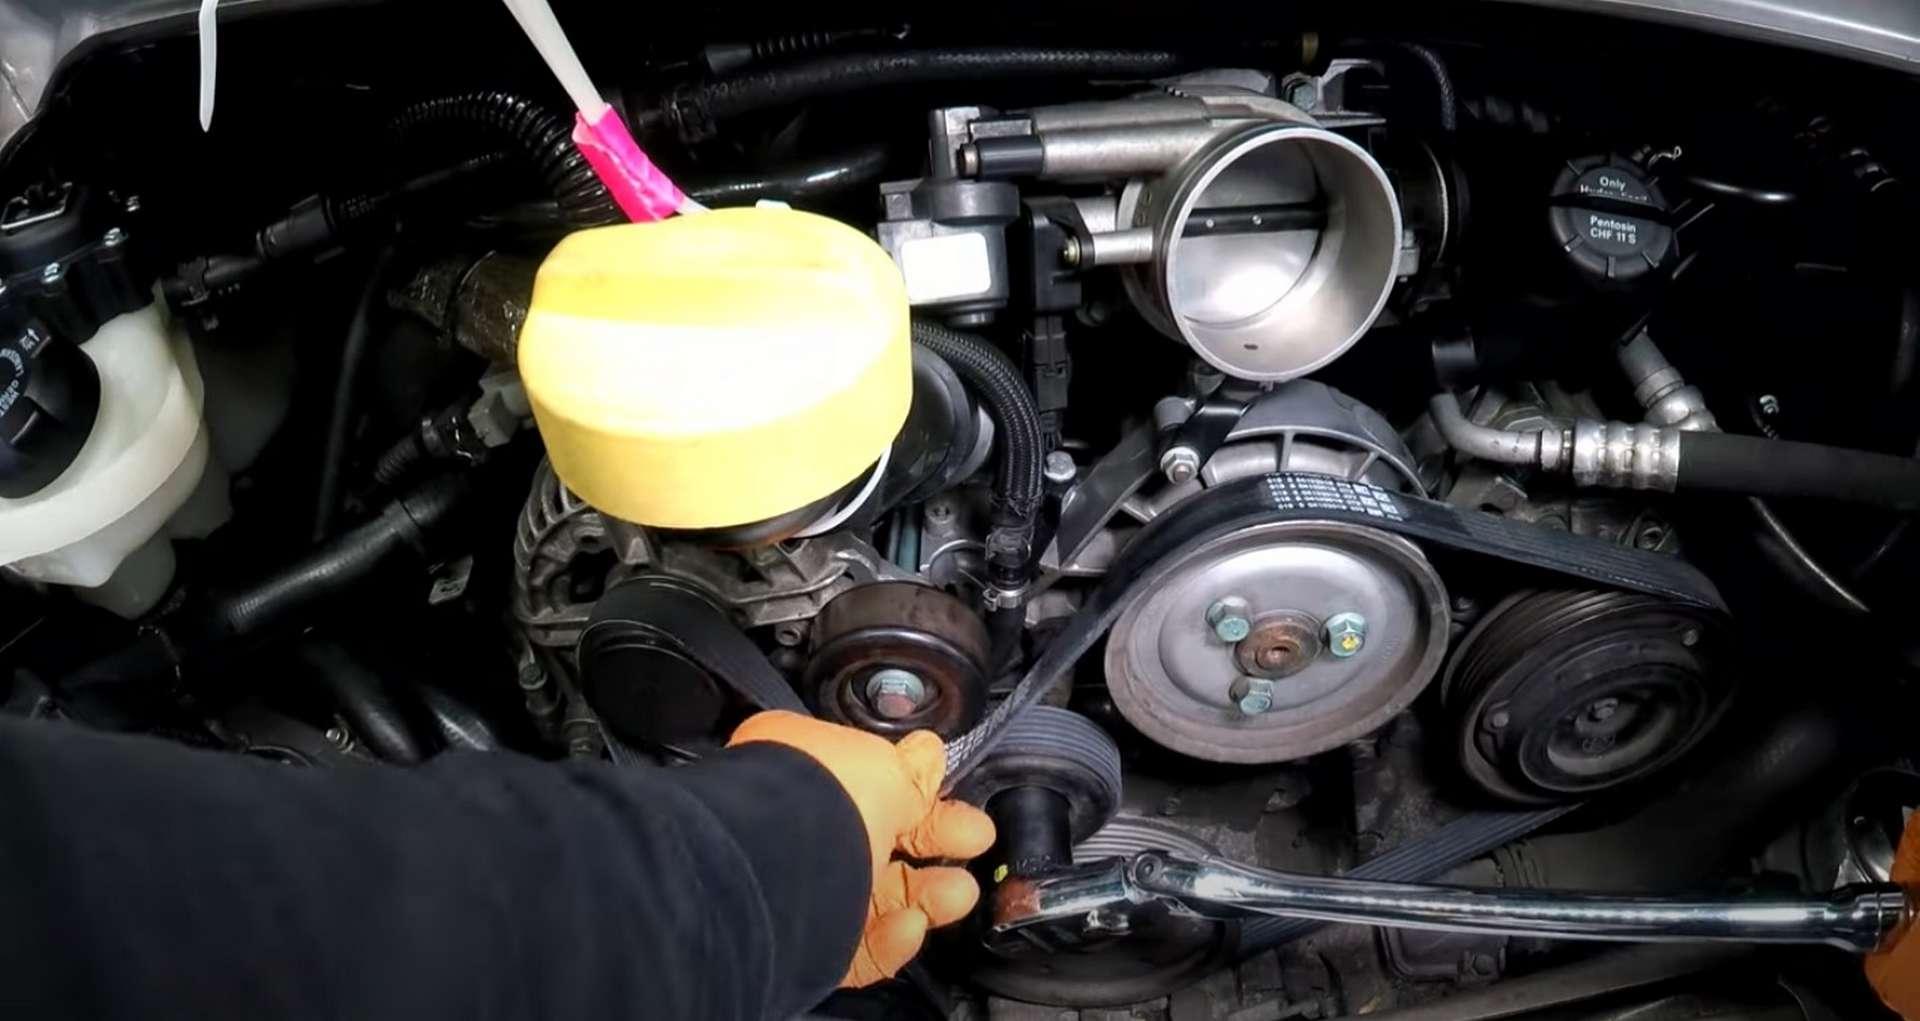 06-DIY-Porsche-996-Accessory-Belt-Replacement_Removing_Belt